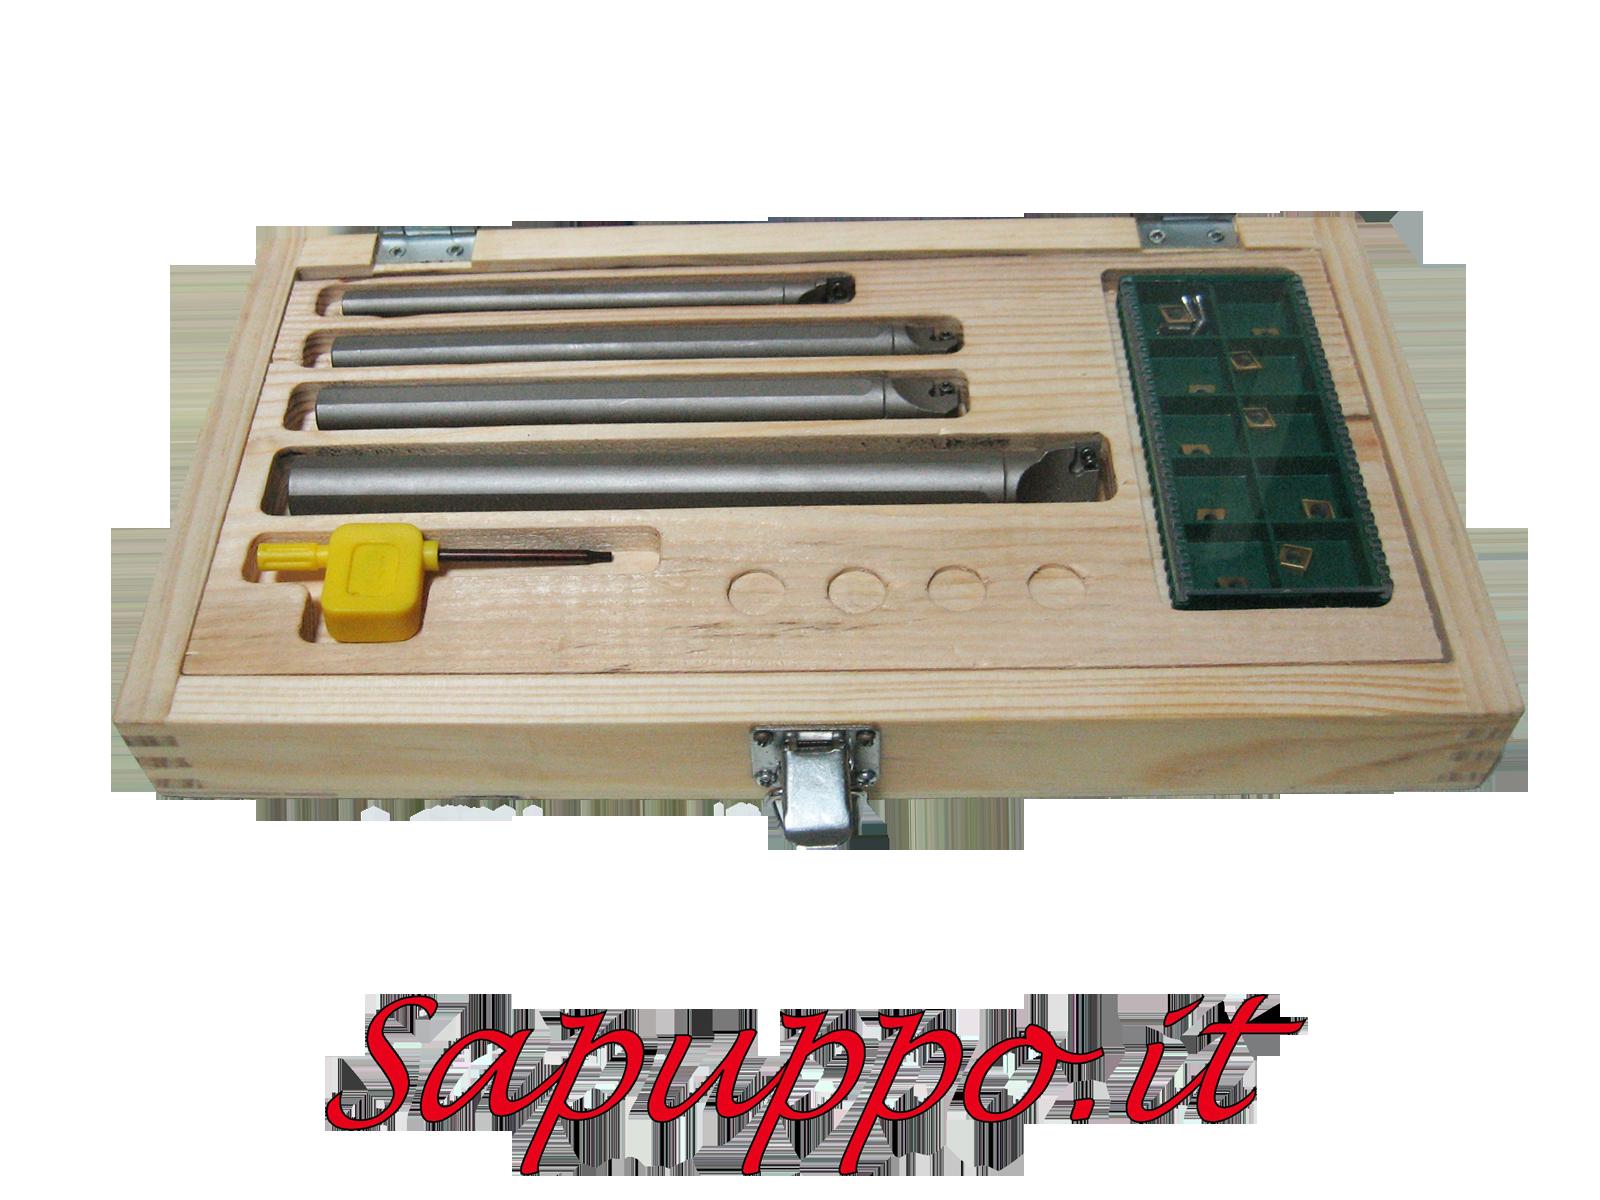 Kit 4 utensili per interni sclcr per placchette ccmt06 for Kit tornio